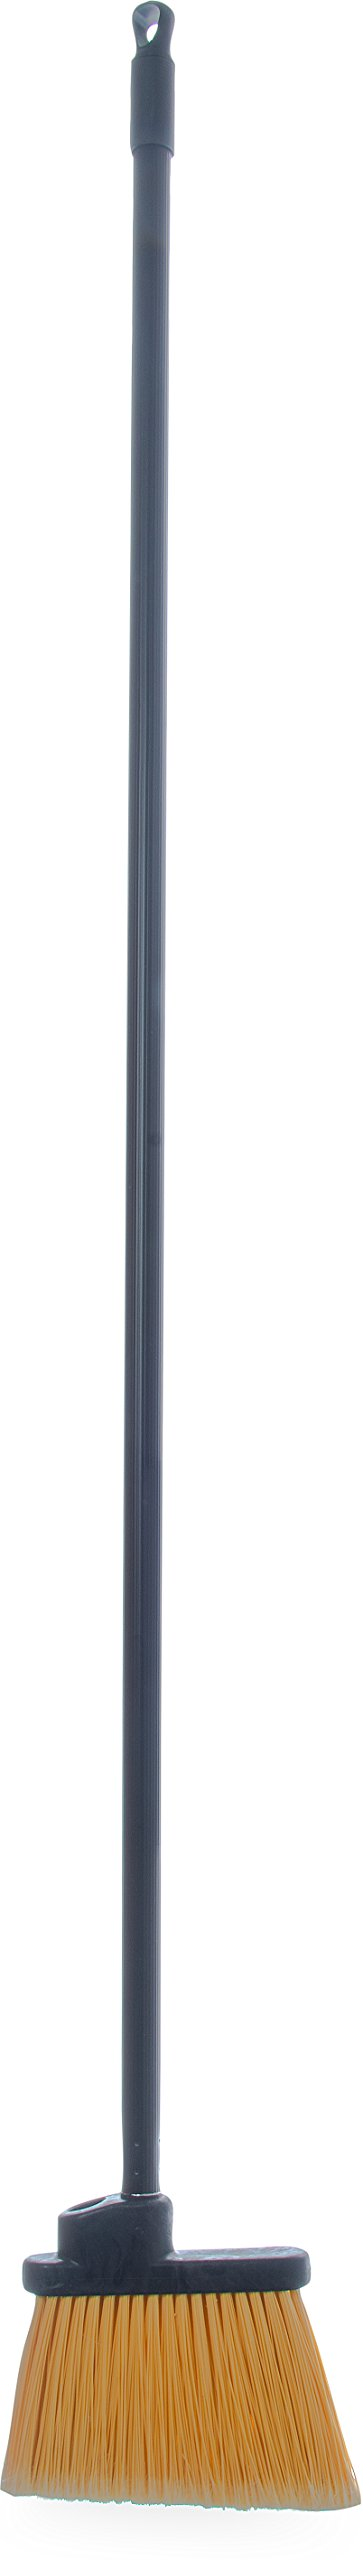 Carlisle 36861L00 Duo-Sweep Lobby Angle Broom, 48'' Handle, 6.5'' Broom Head, Black (Pack of 12) by Carlisle